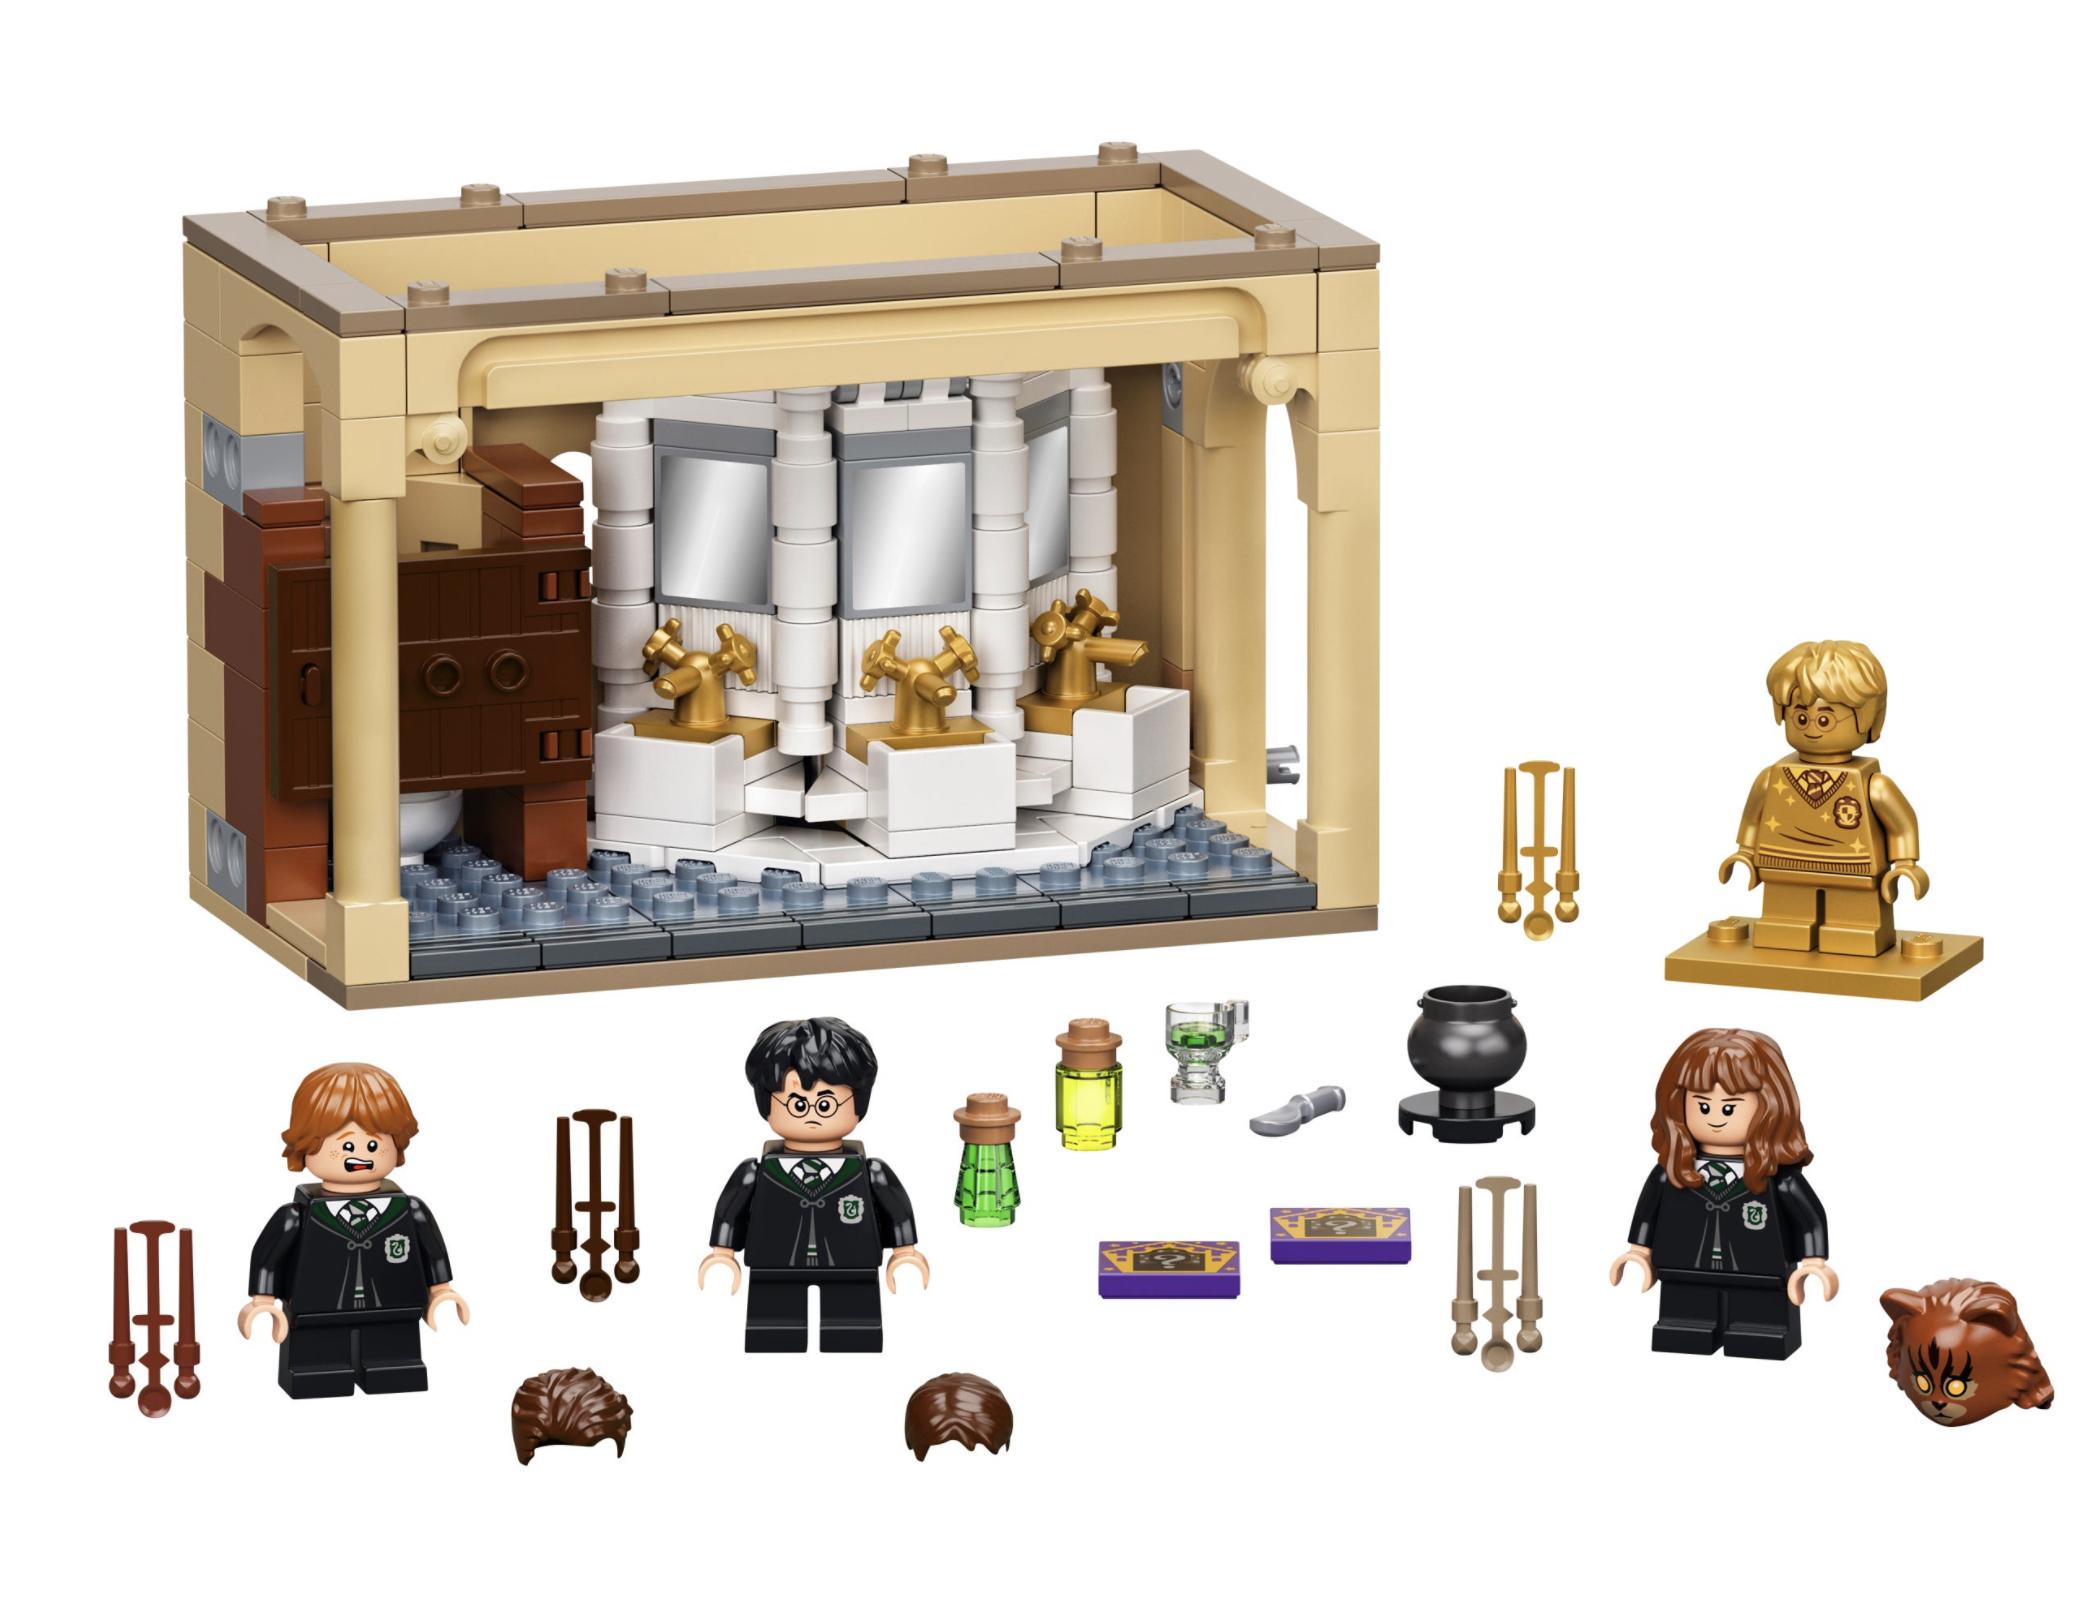 Hogwarts Polyjuice Potion Mistake LEGO set, best toys for 7 year old boys